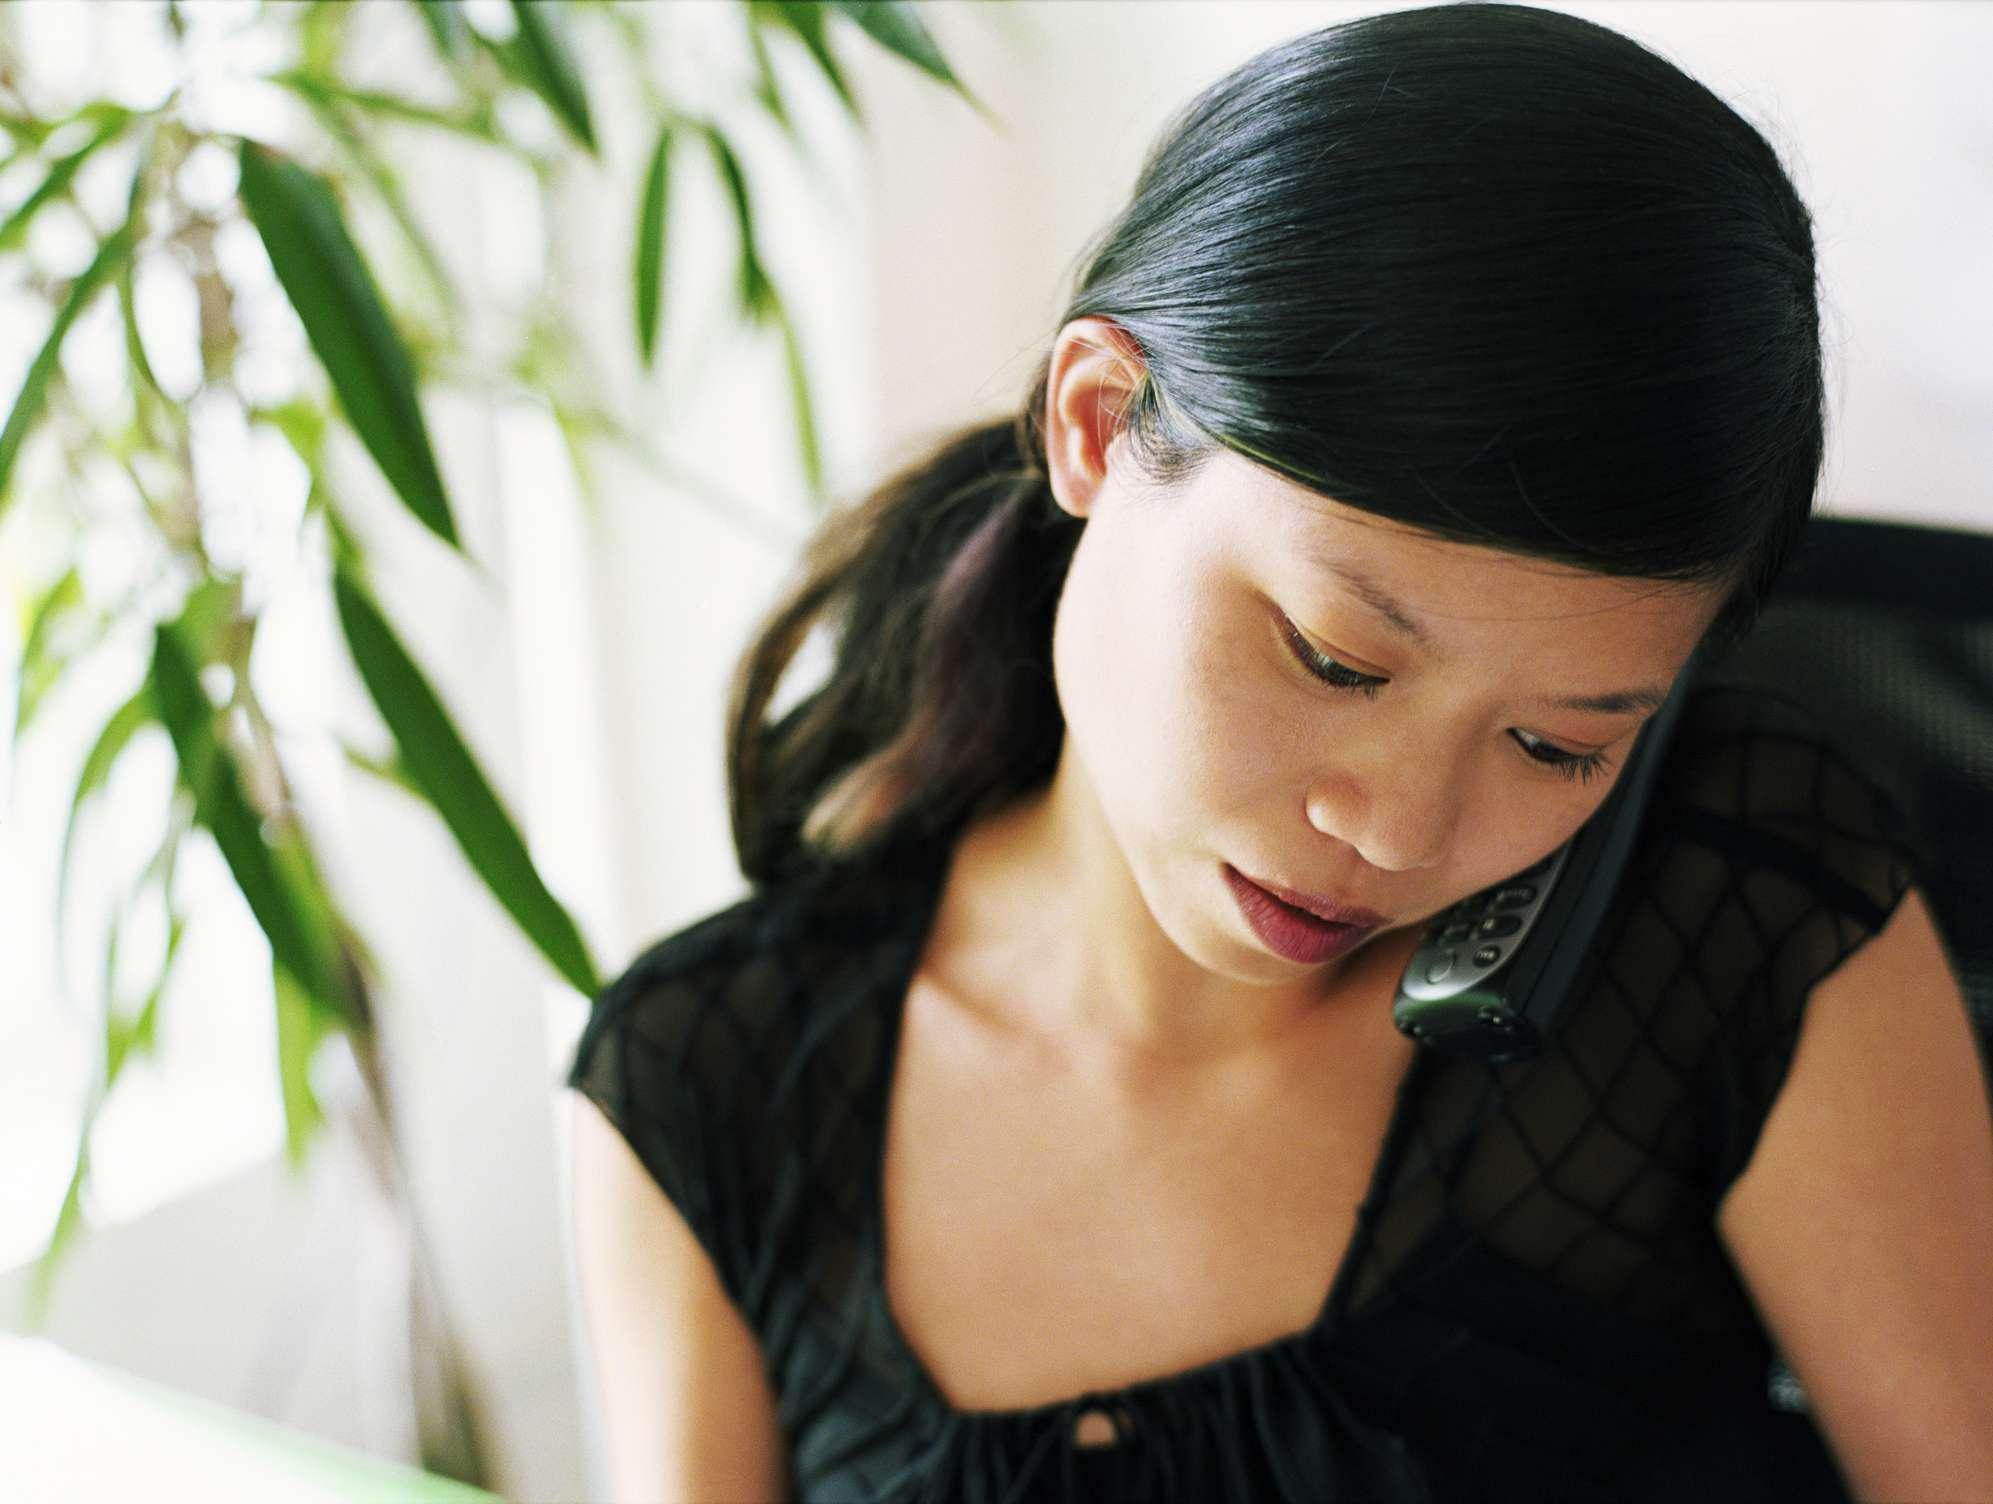 Woman Cradling the phone between head and shoulders